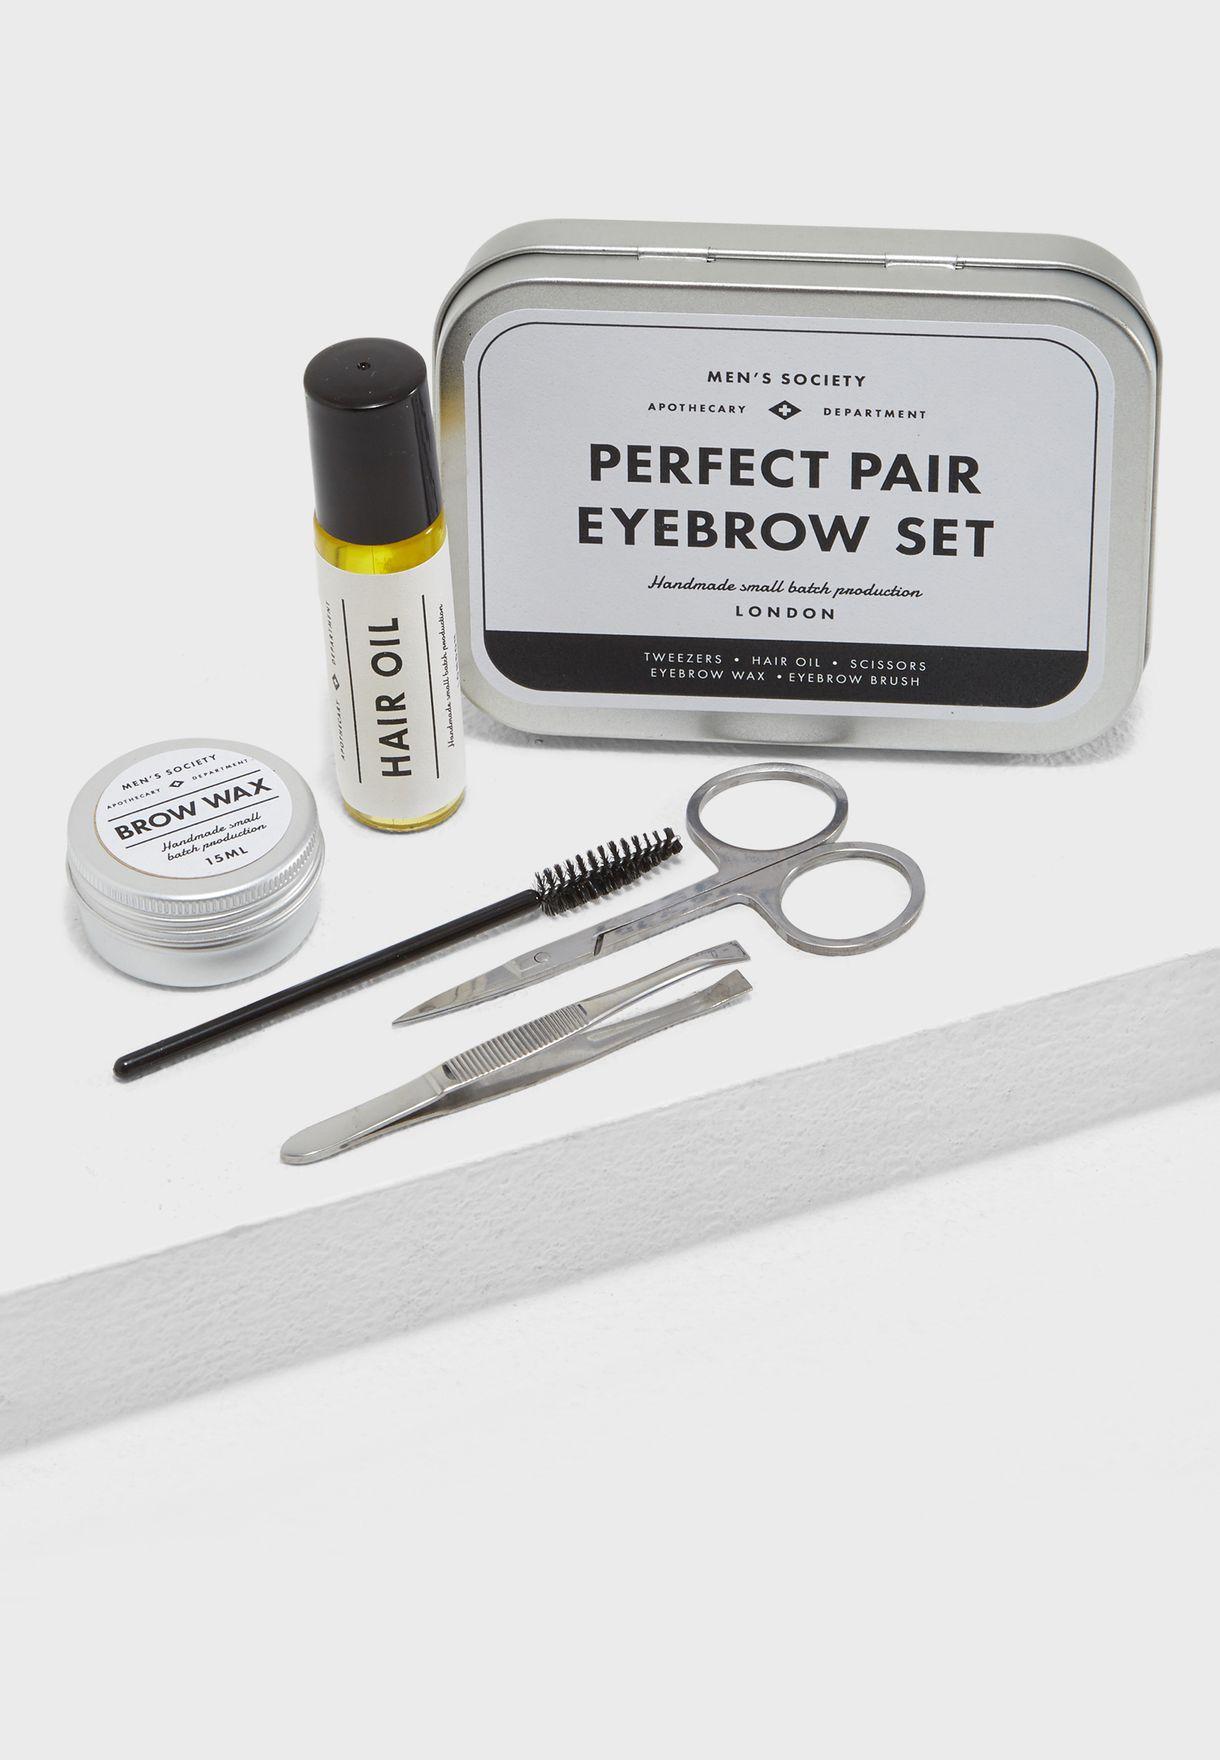 Perfect Pair Eyebrow Grooming Kit